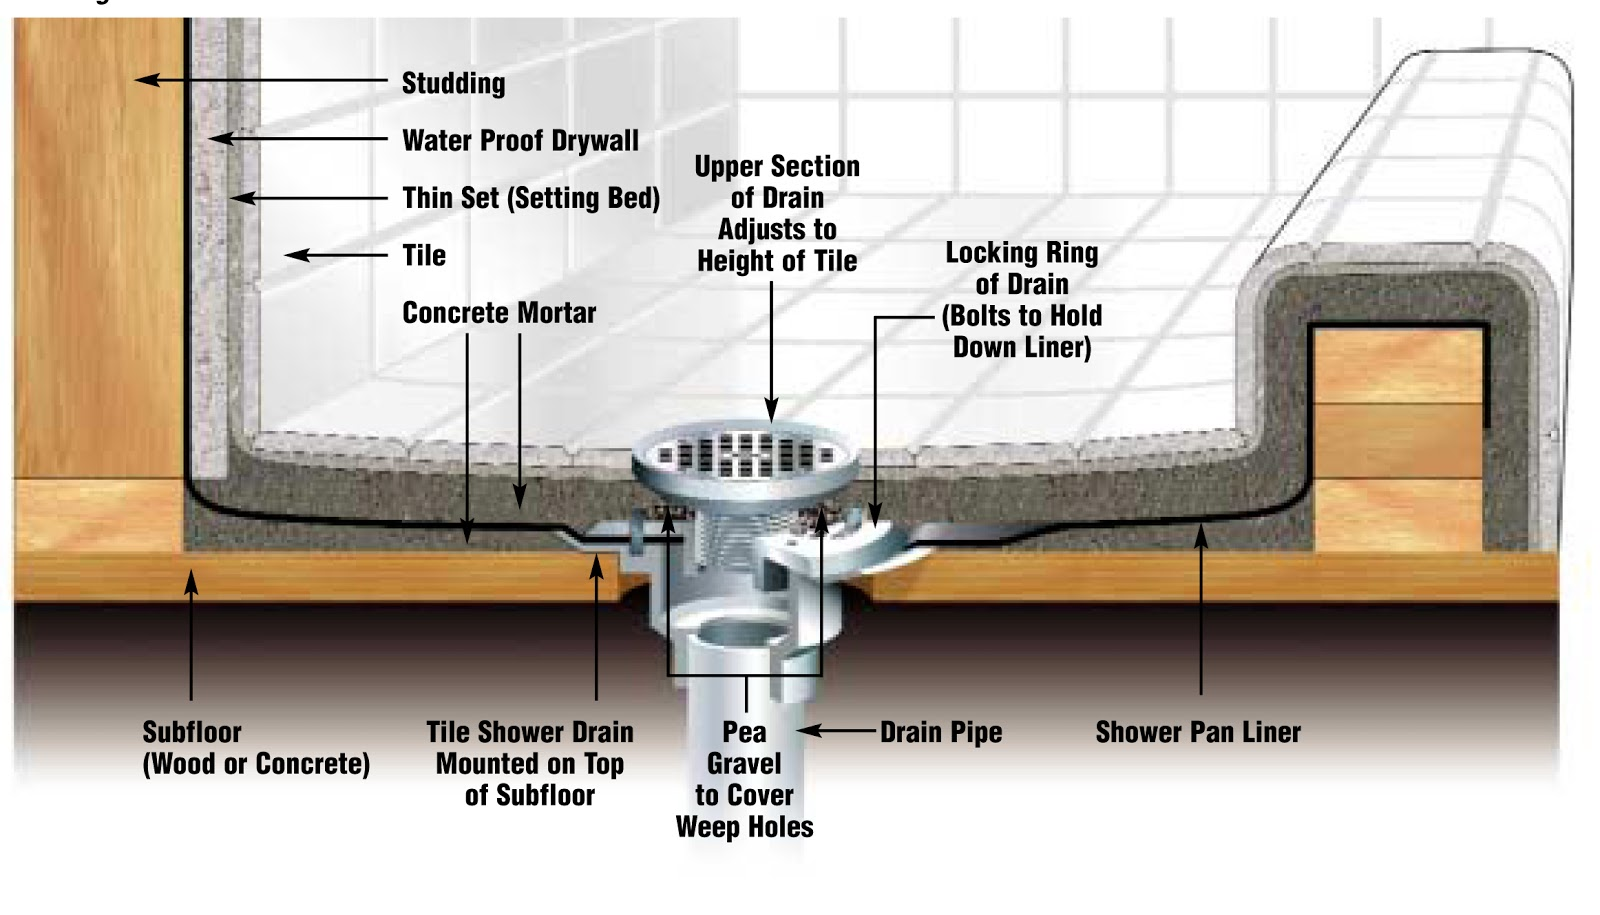 schluter shower systems \u2013 page 313 \u2013 glens falls tile \u0026 supplies Cross Section of Shower Pan